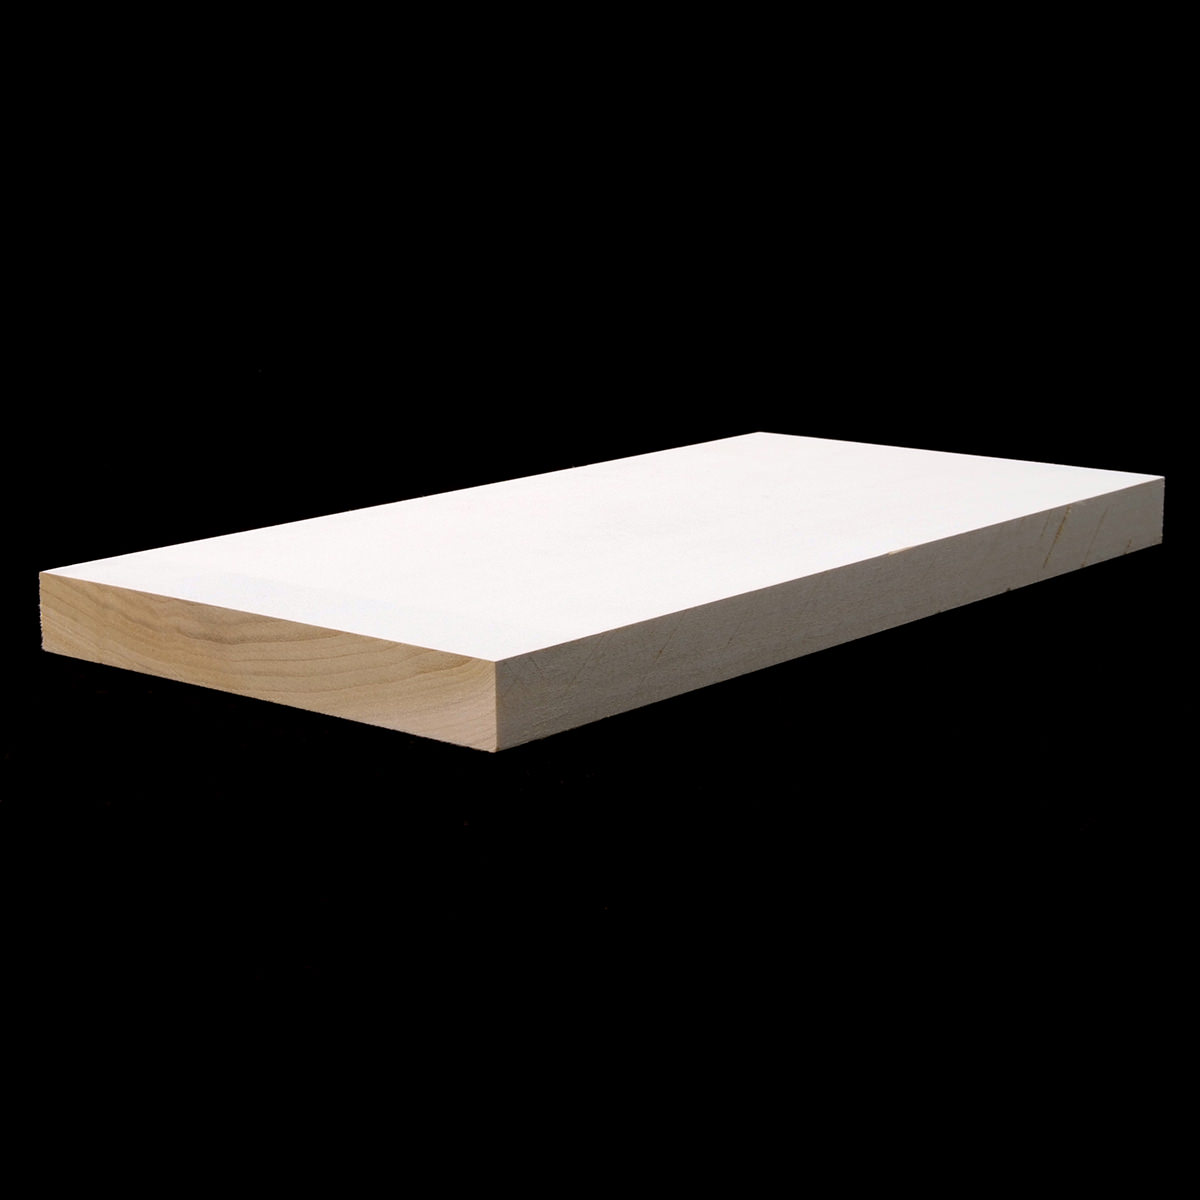 1x6 3 4 x 5 1 2 f j primed poplar s4s lumber boards flat